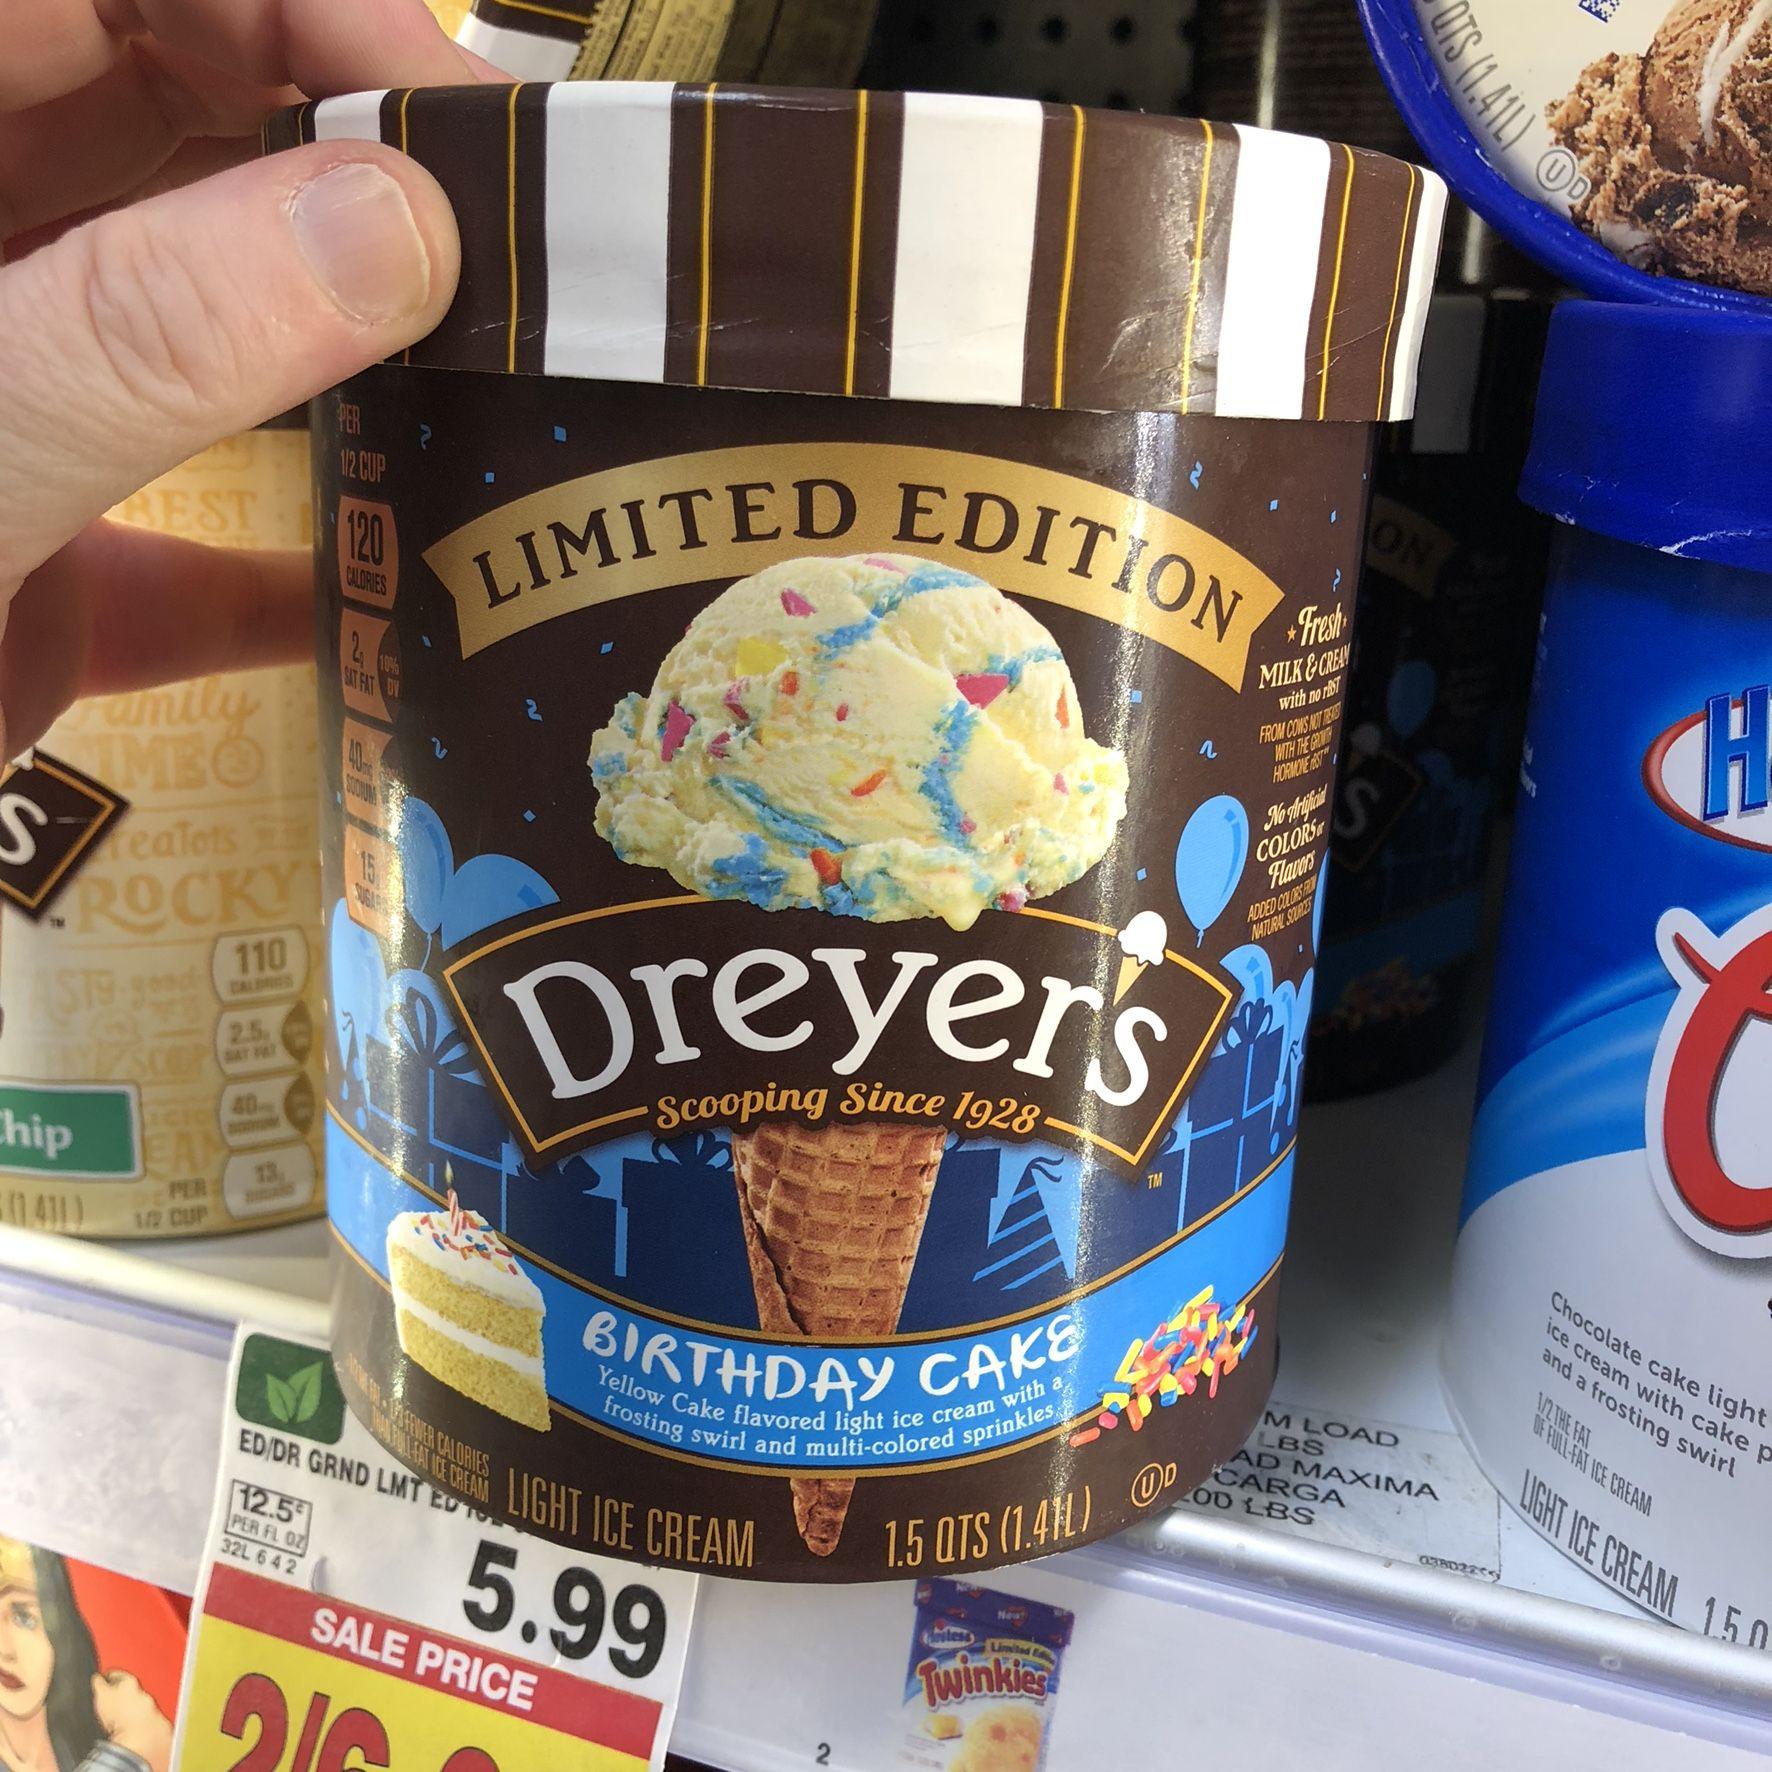 Found dreyers limited edition birthday cake ice cream